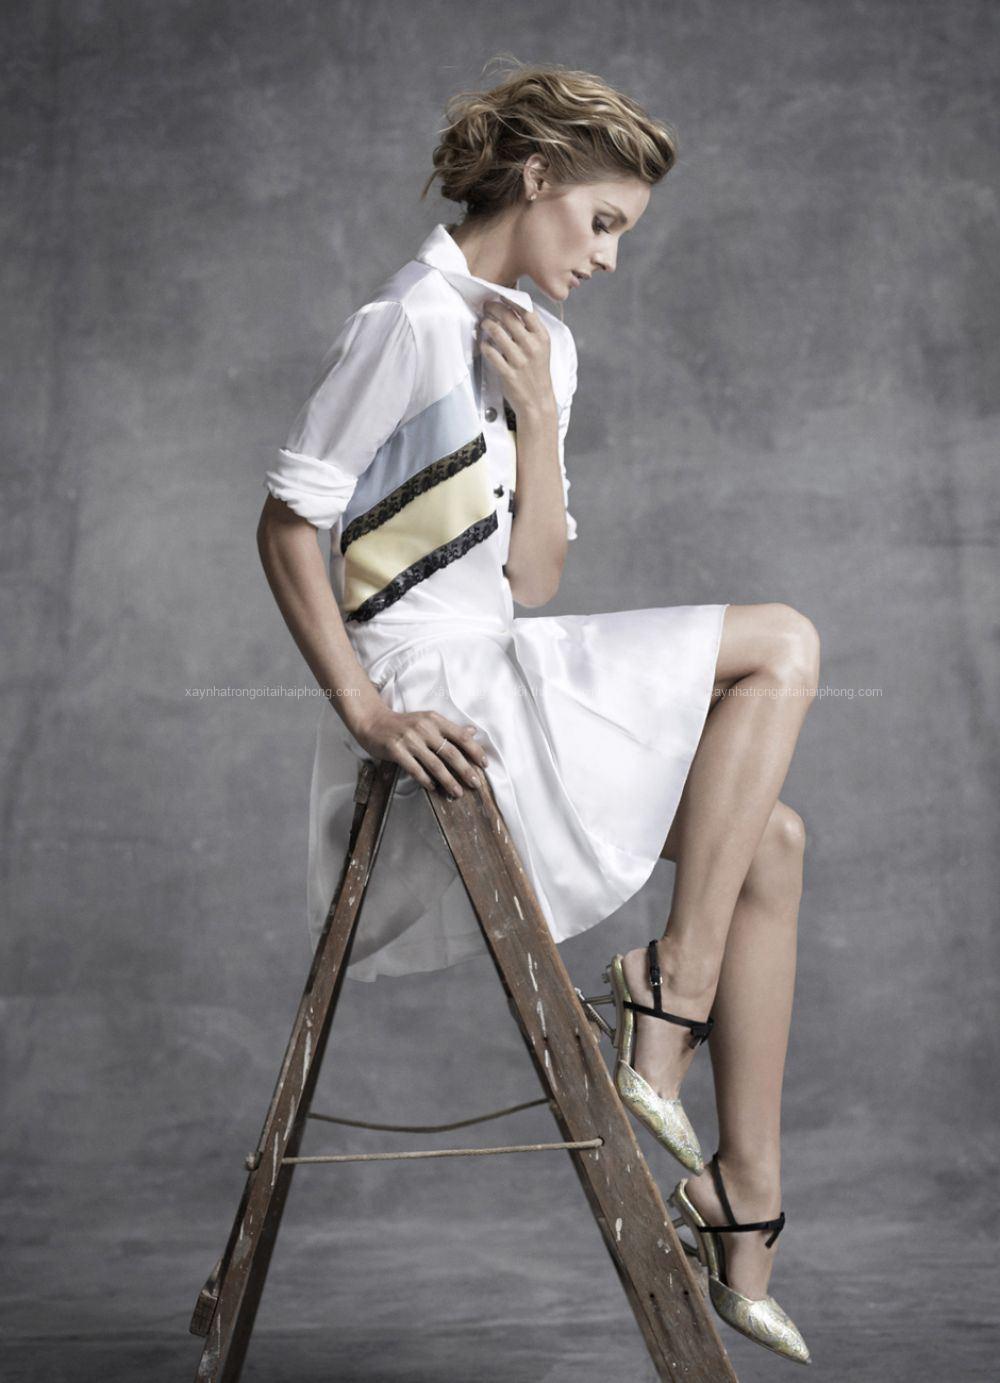 olivia palermo in jez smith photoshoot for harper s bazaar australia november 2014 3 - Two Chairs, Lots of Minimalism